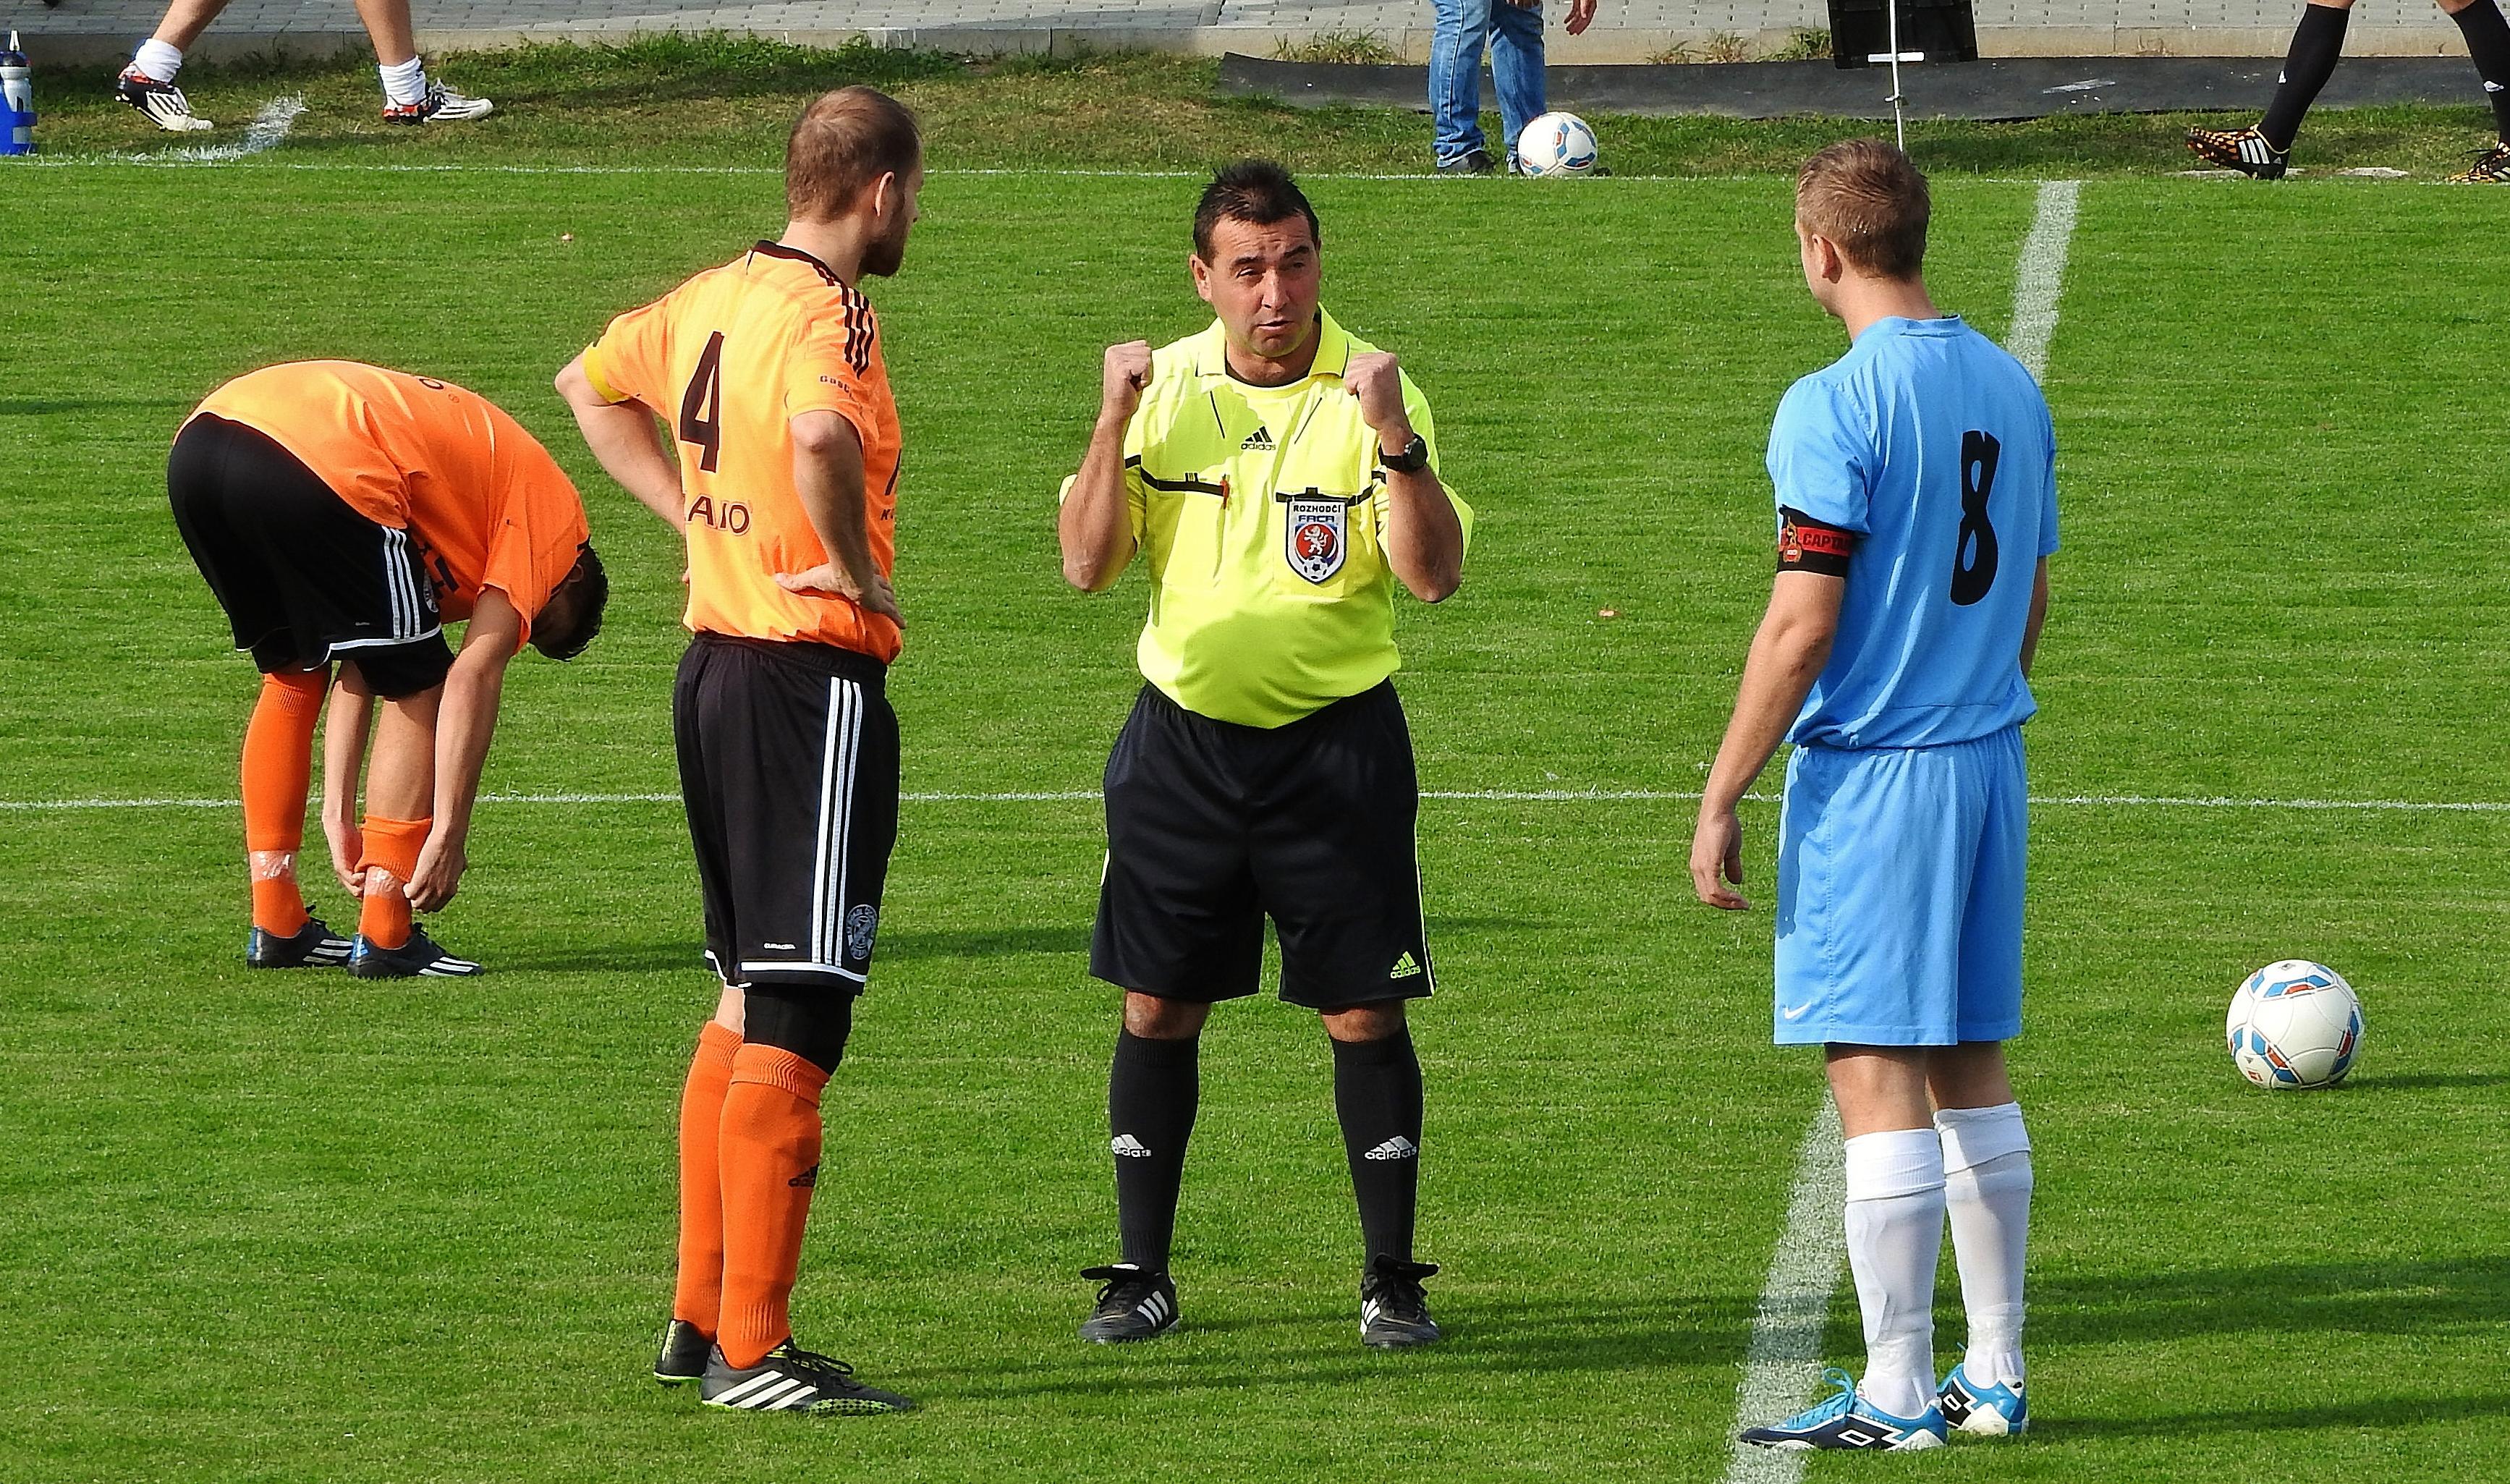 FC Beňov - Sokol Čechovice 3:5 (0:3)